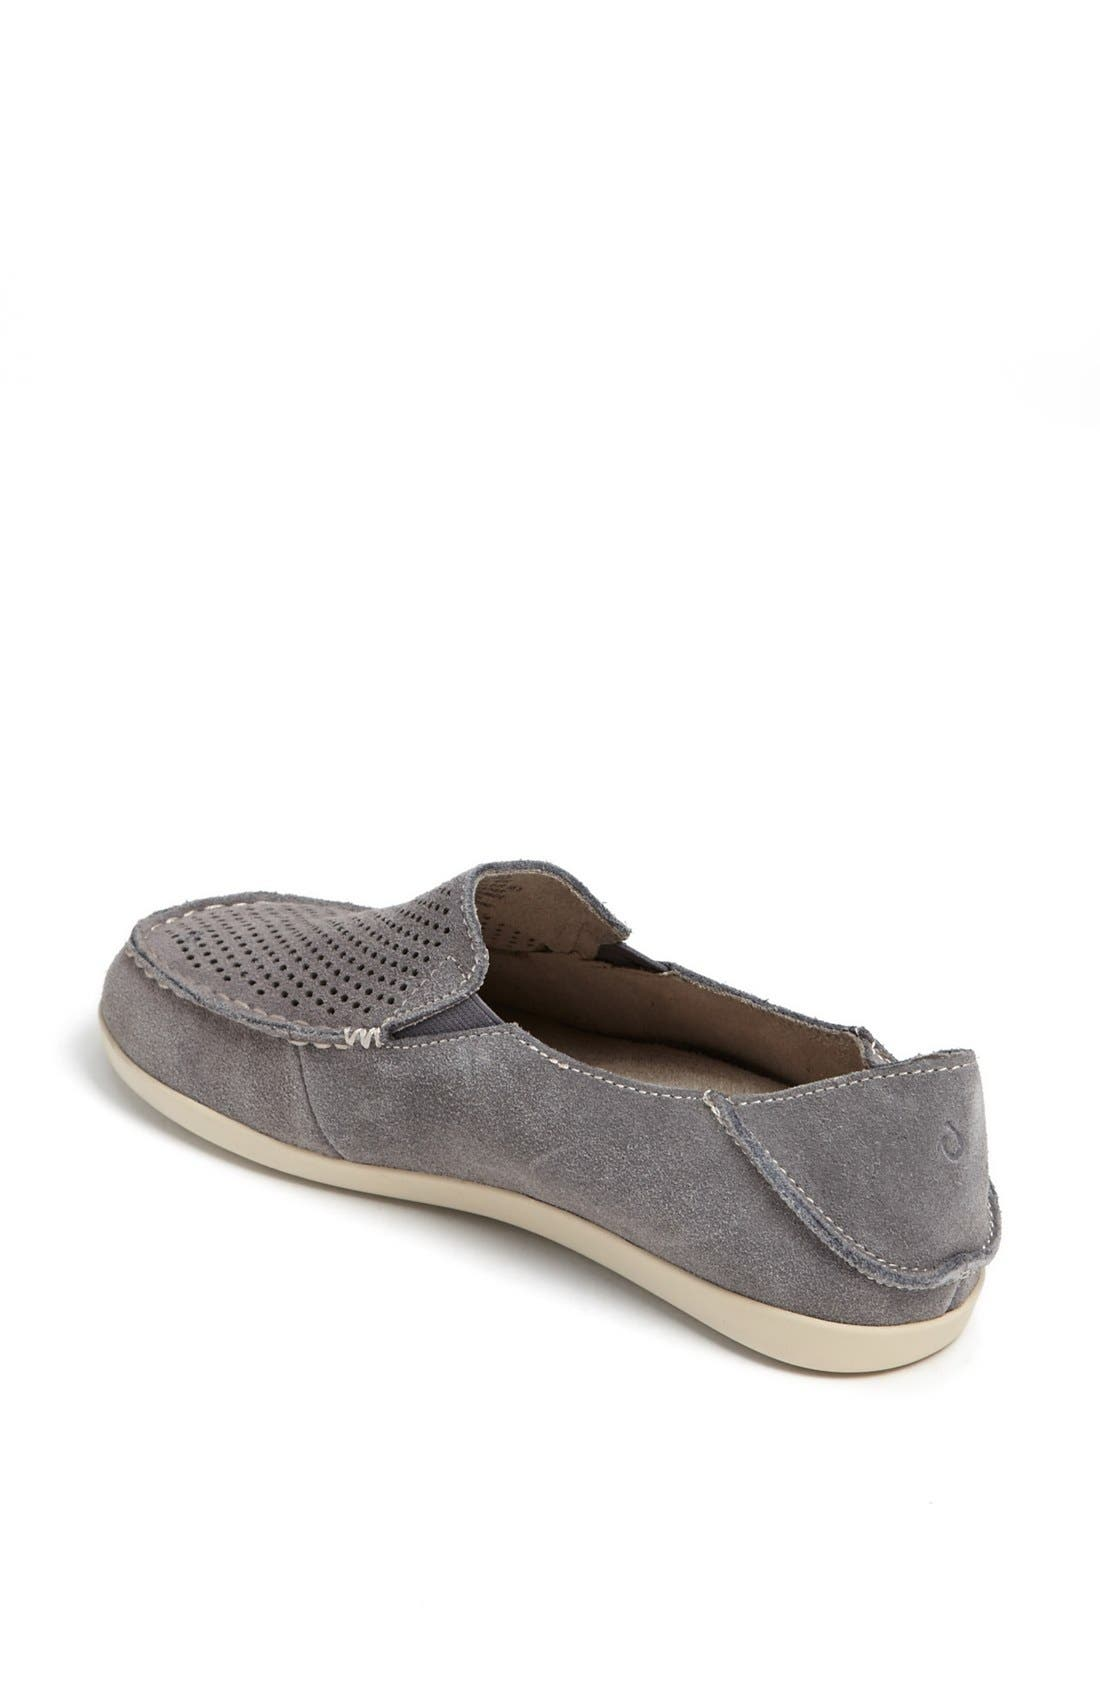 Alternate Image 2  - OluKai 'Nohea' Sneaker